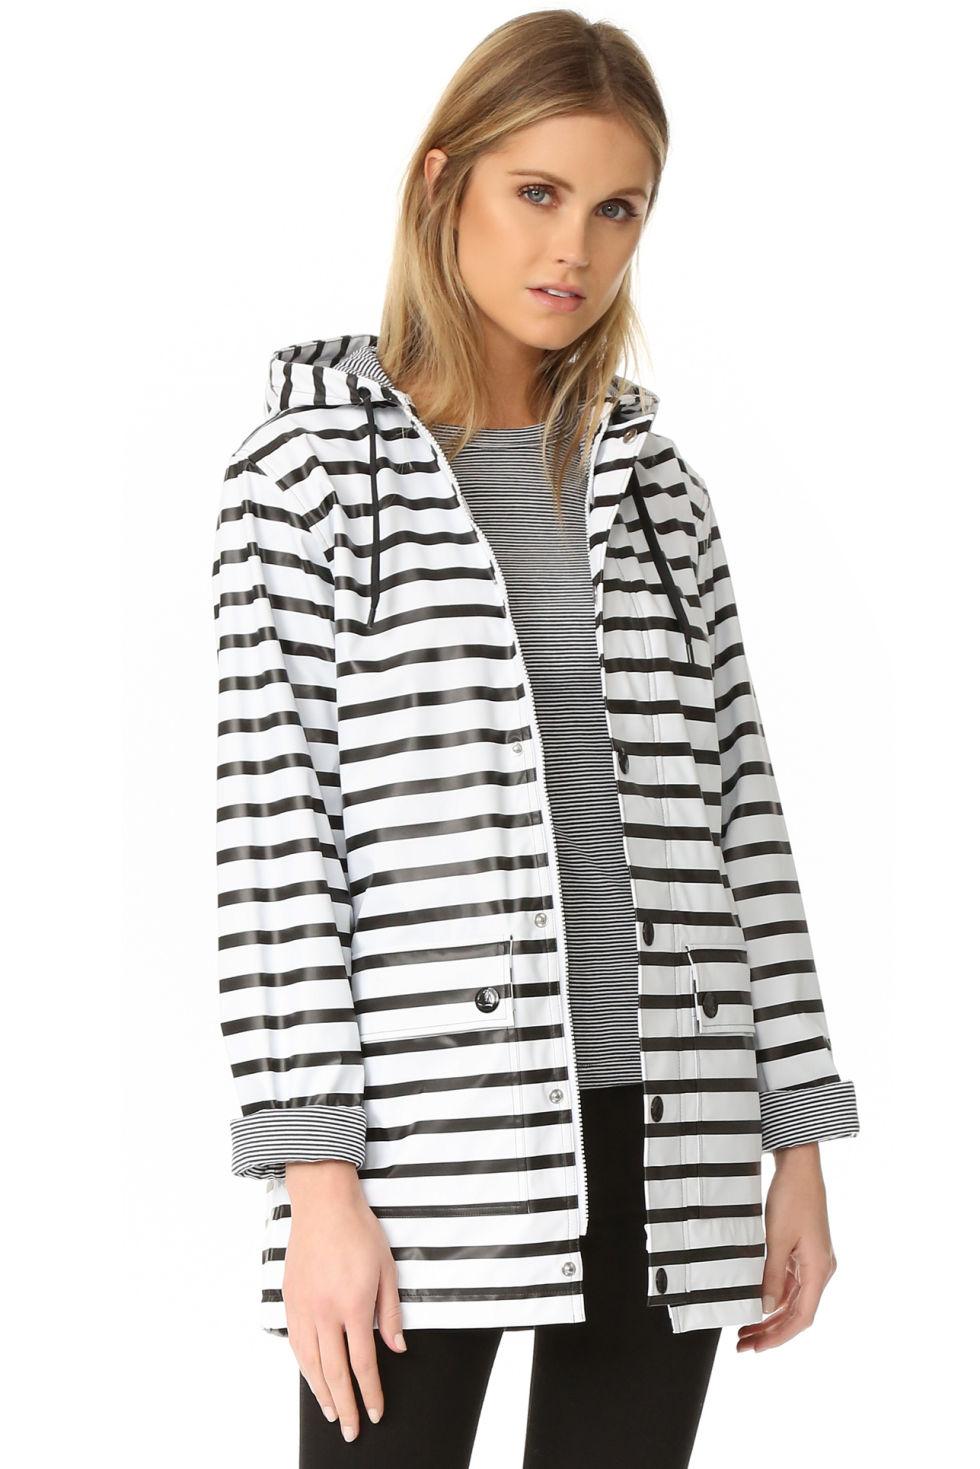 15 cute spring raincoats - best raincoats for women MFBQKHO